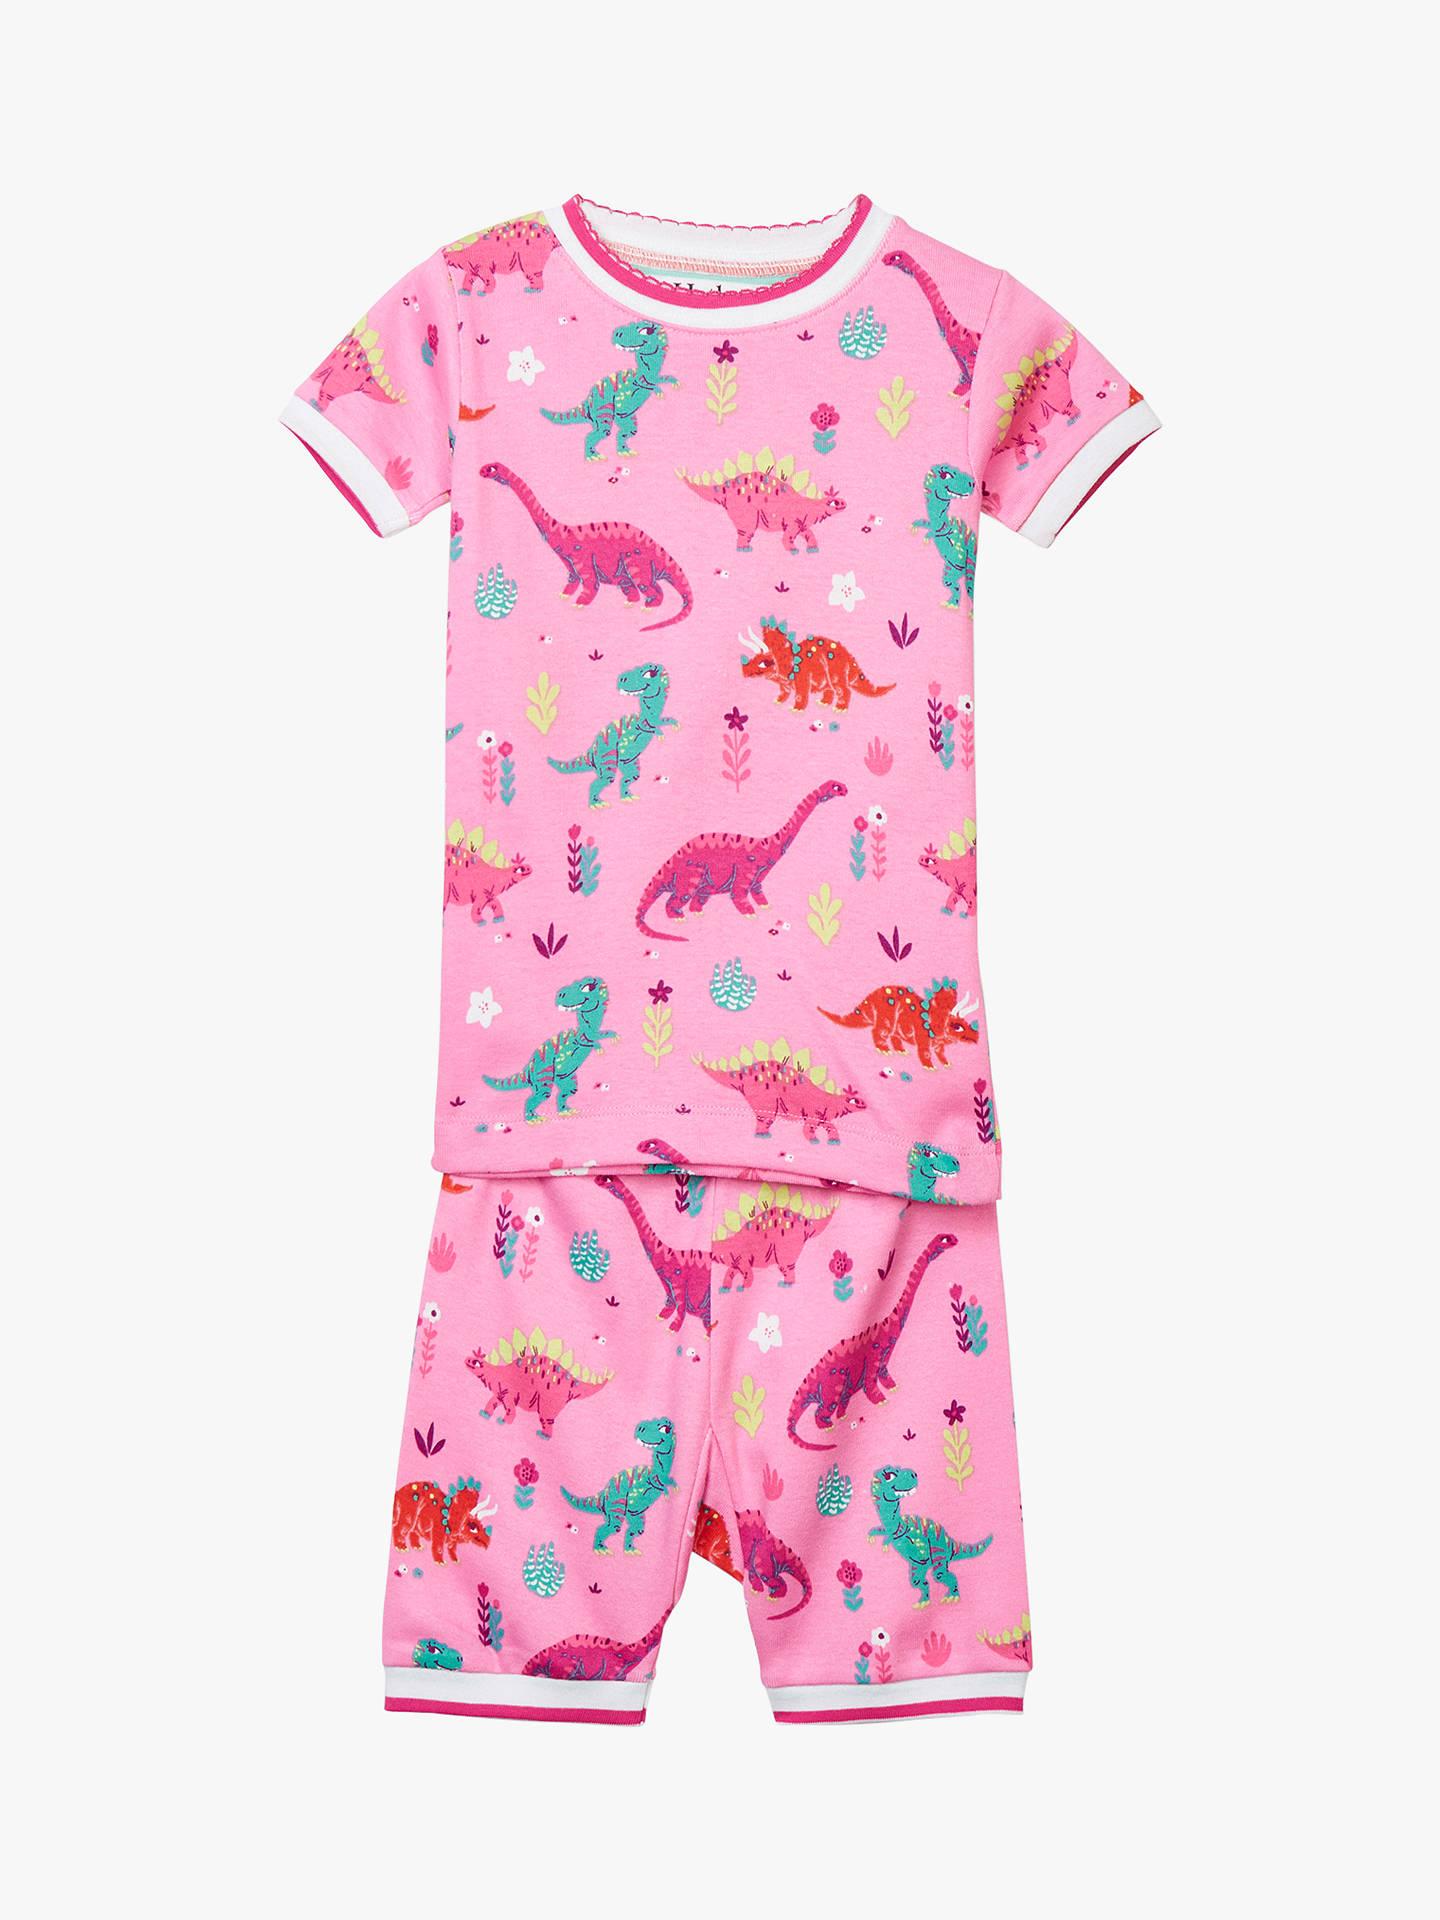 BuyHatley Girls  Dinosaur Organic Cotton Short Pyjamas a5b29fe77